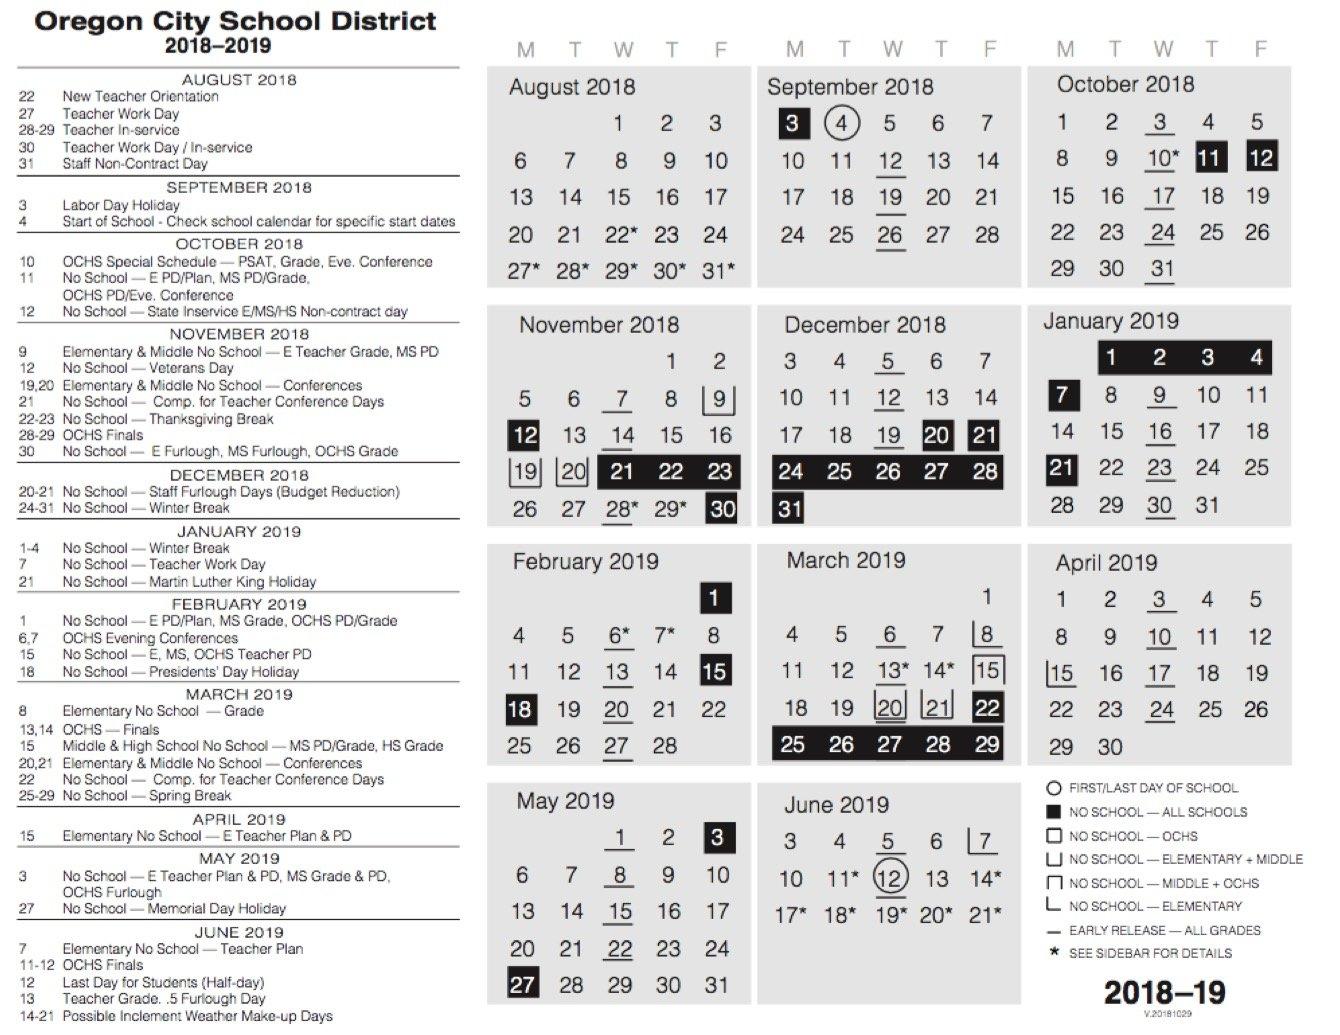 Calendar | Oregon City School District Ccsd Calendar 2019 20